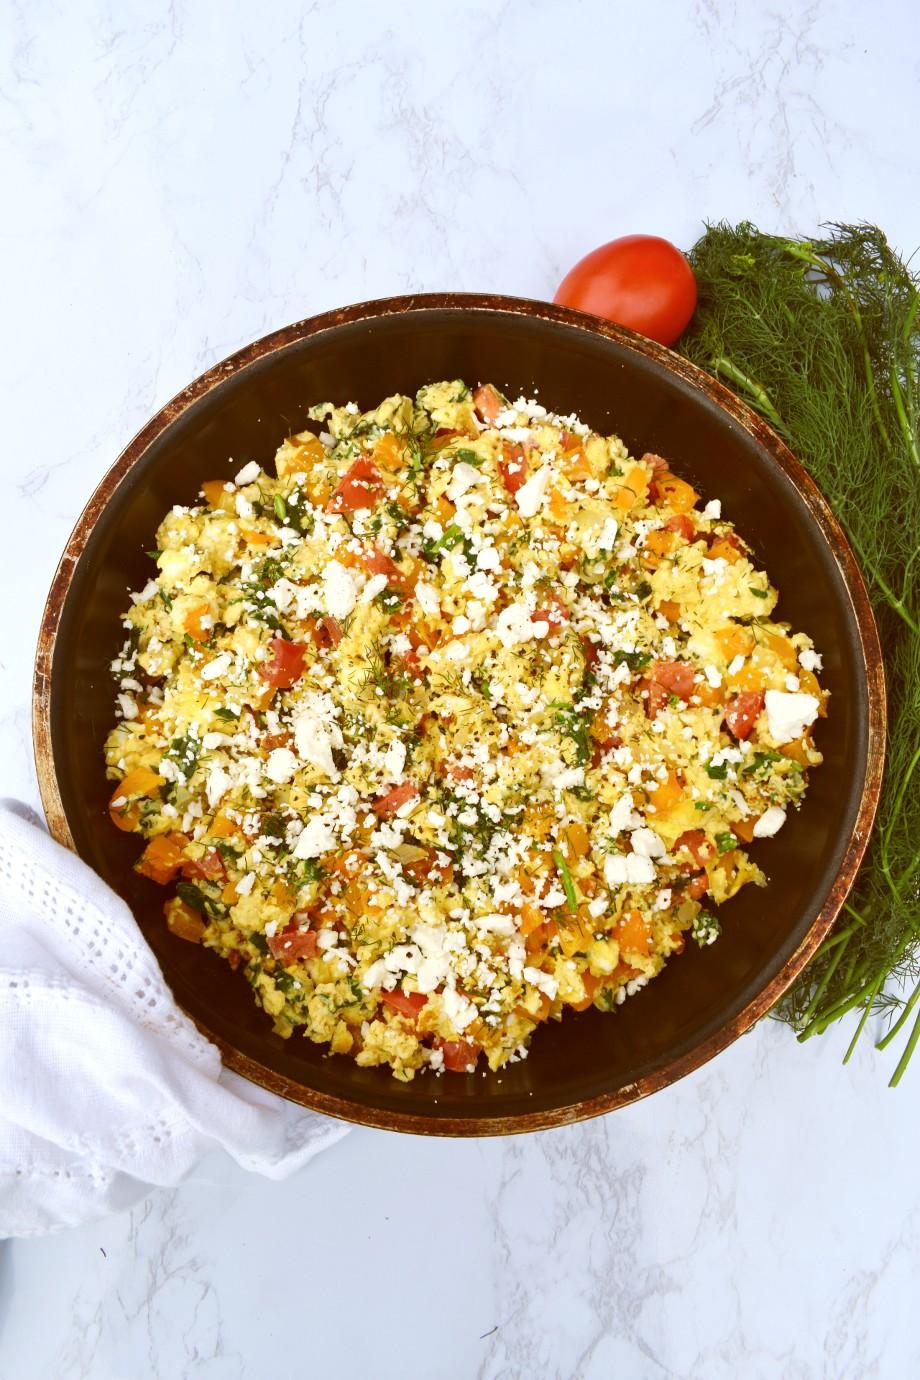 Pan of Greek Scrambled Eggs